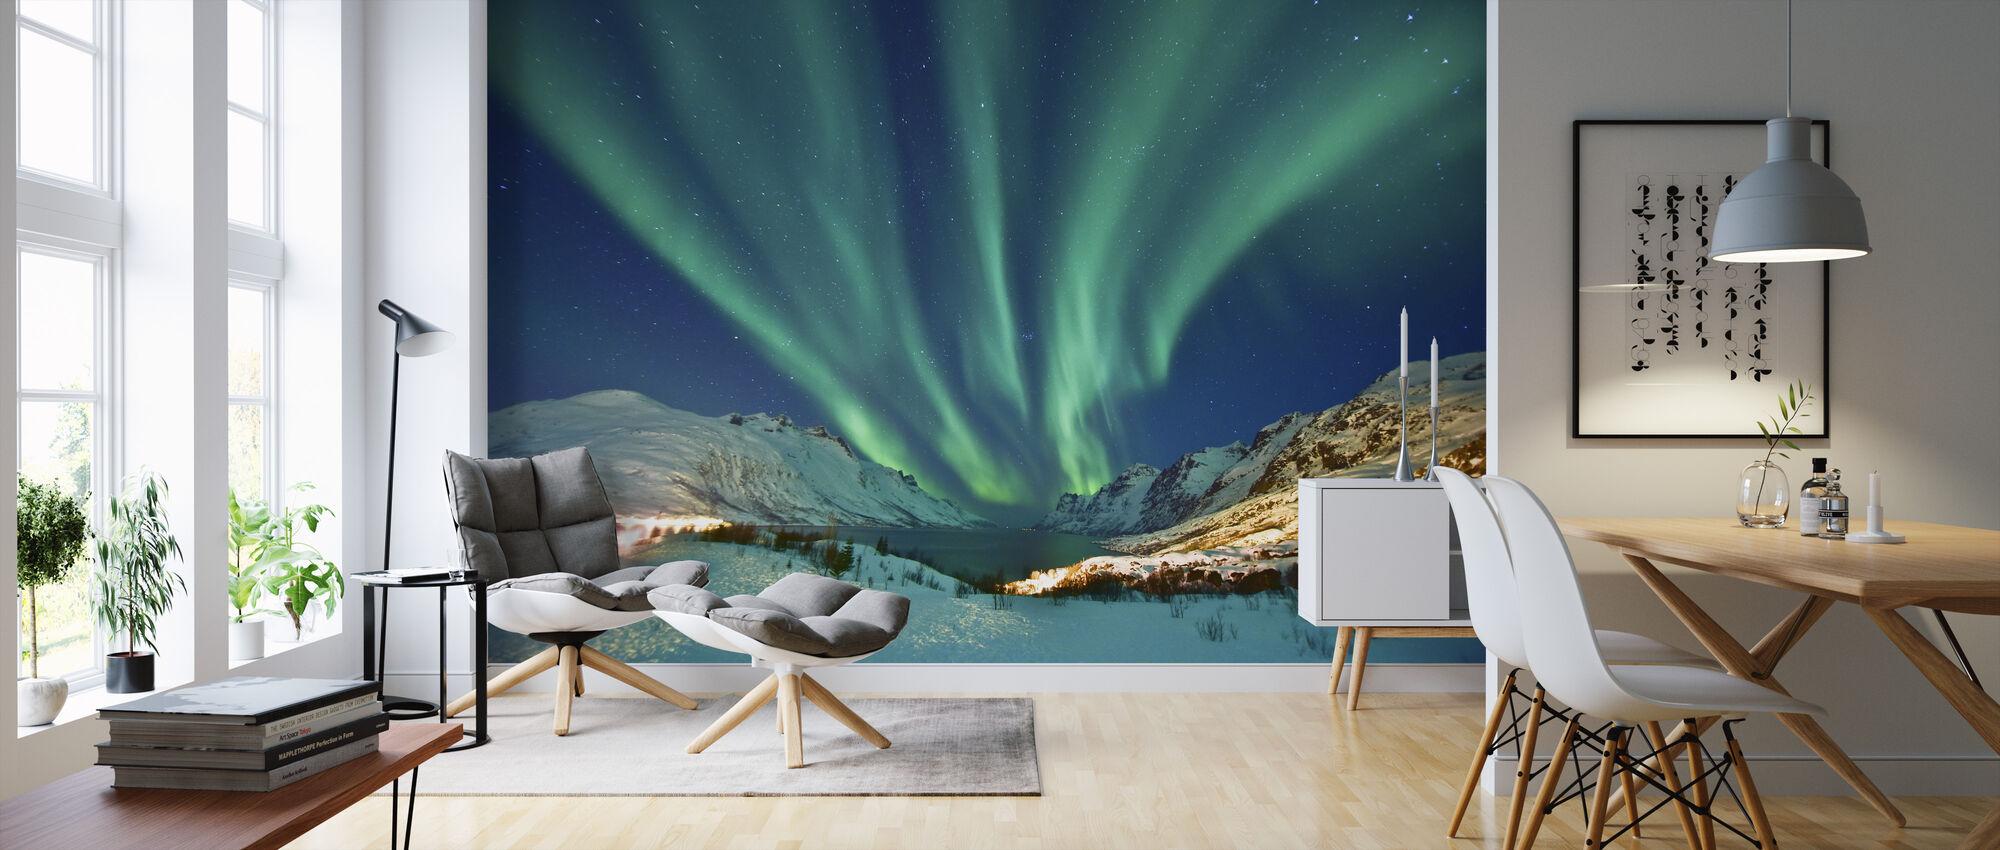 Aurora Borealis - Wallpaper - Living Room